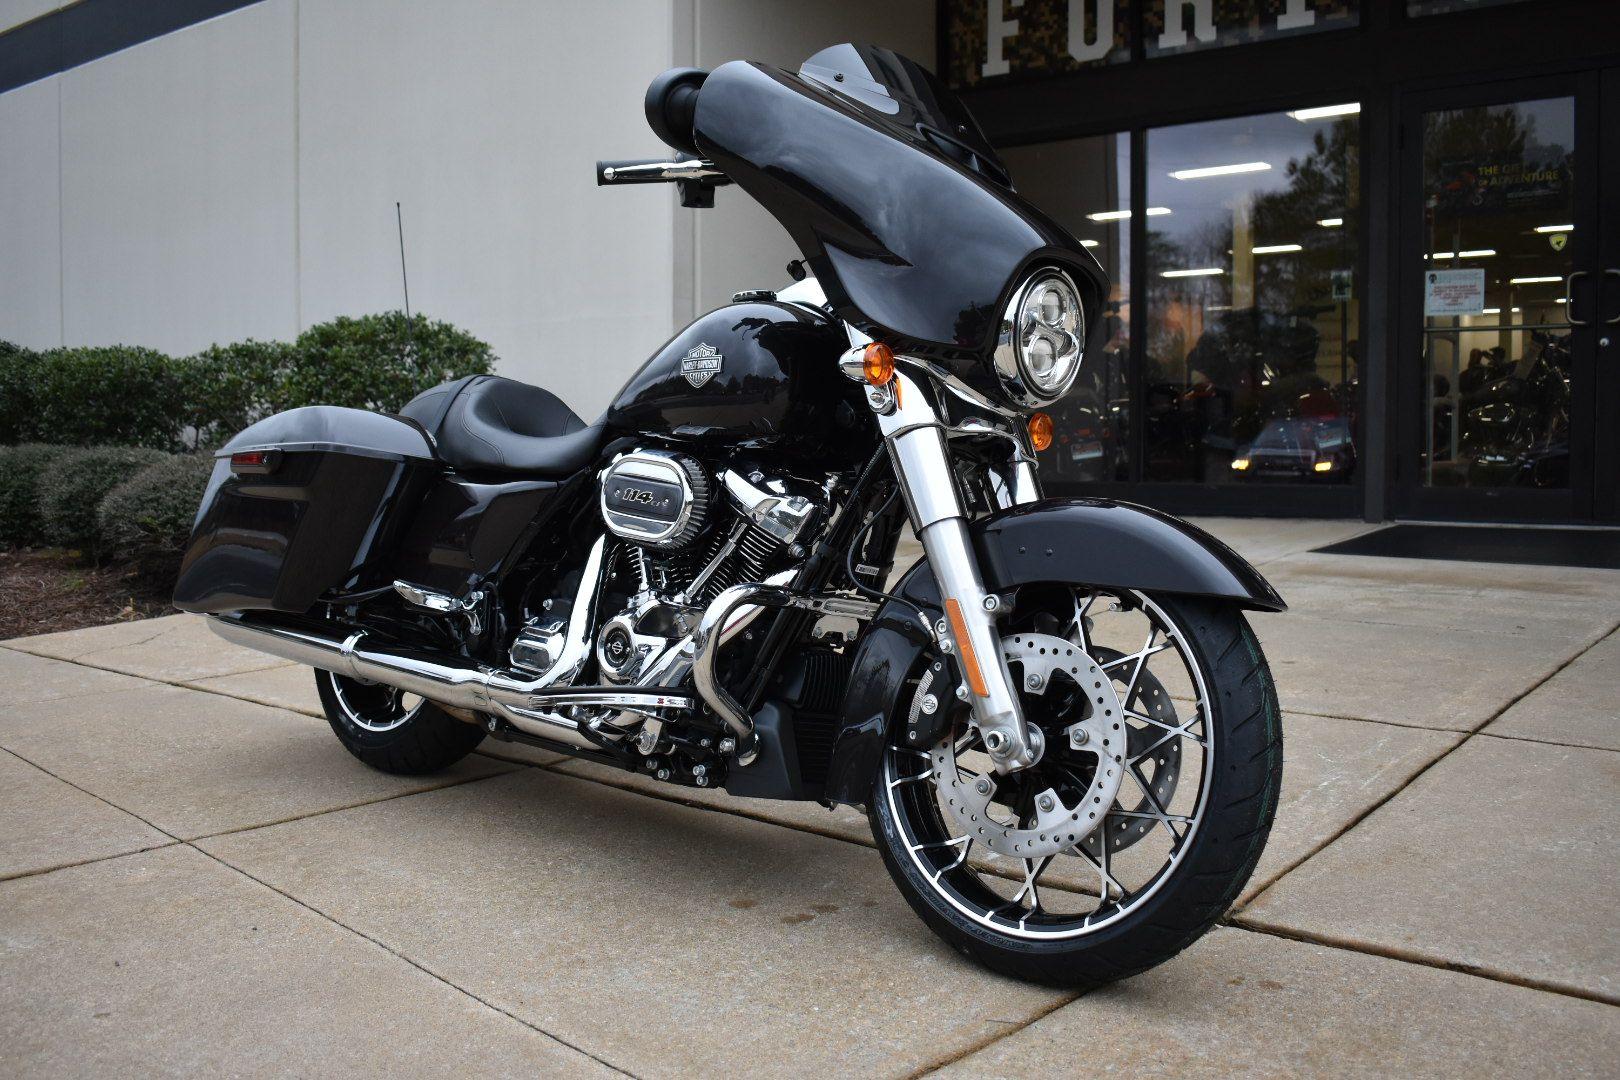 New 2021 Harley-Davidson Street Glide Special FLHXS